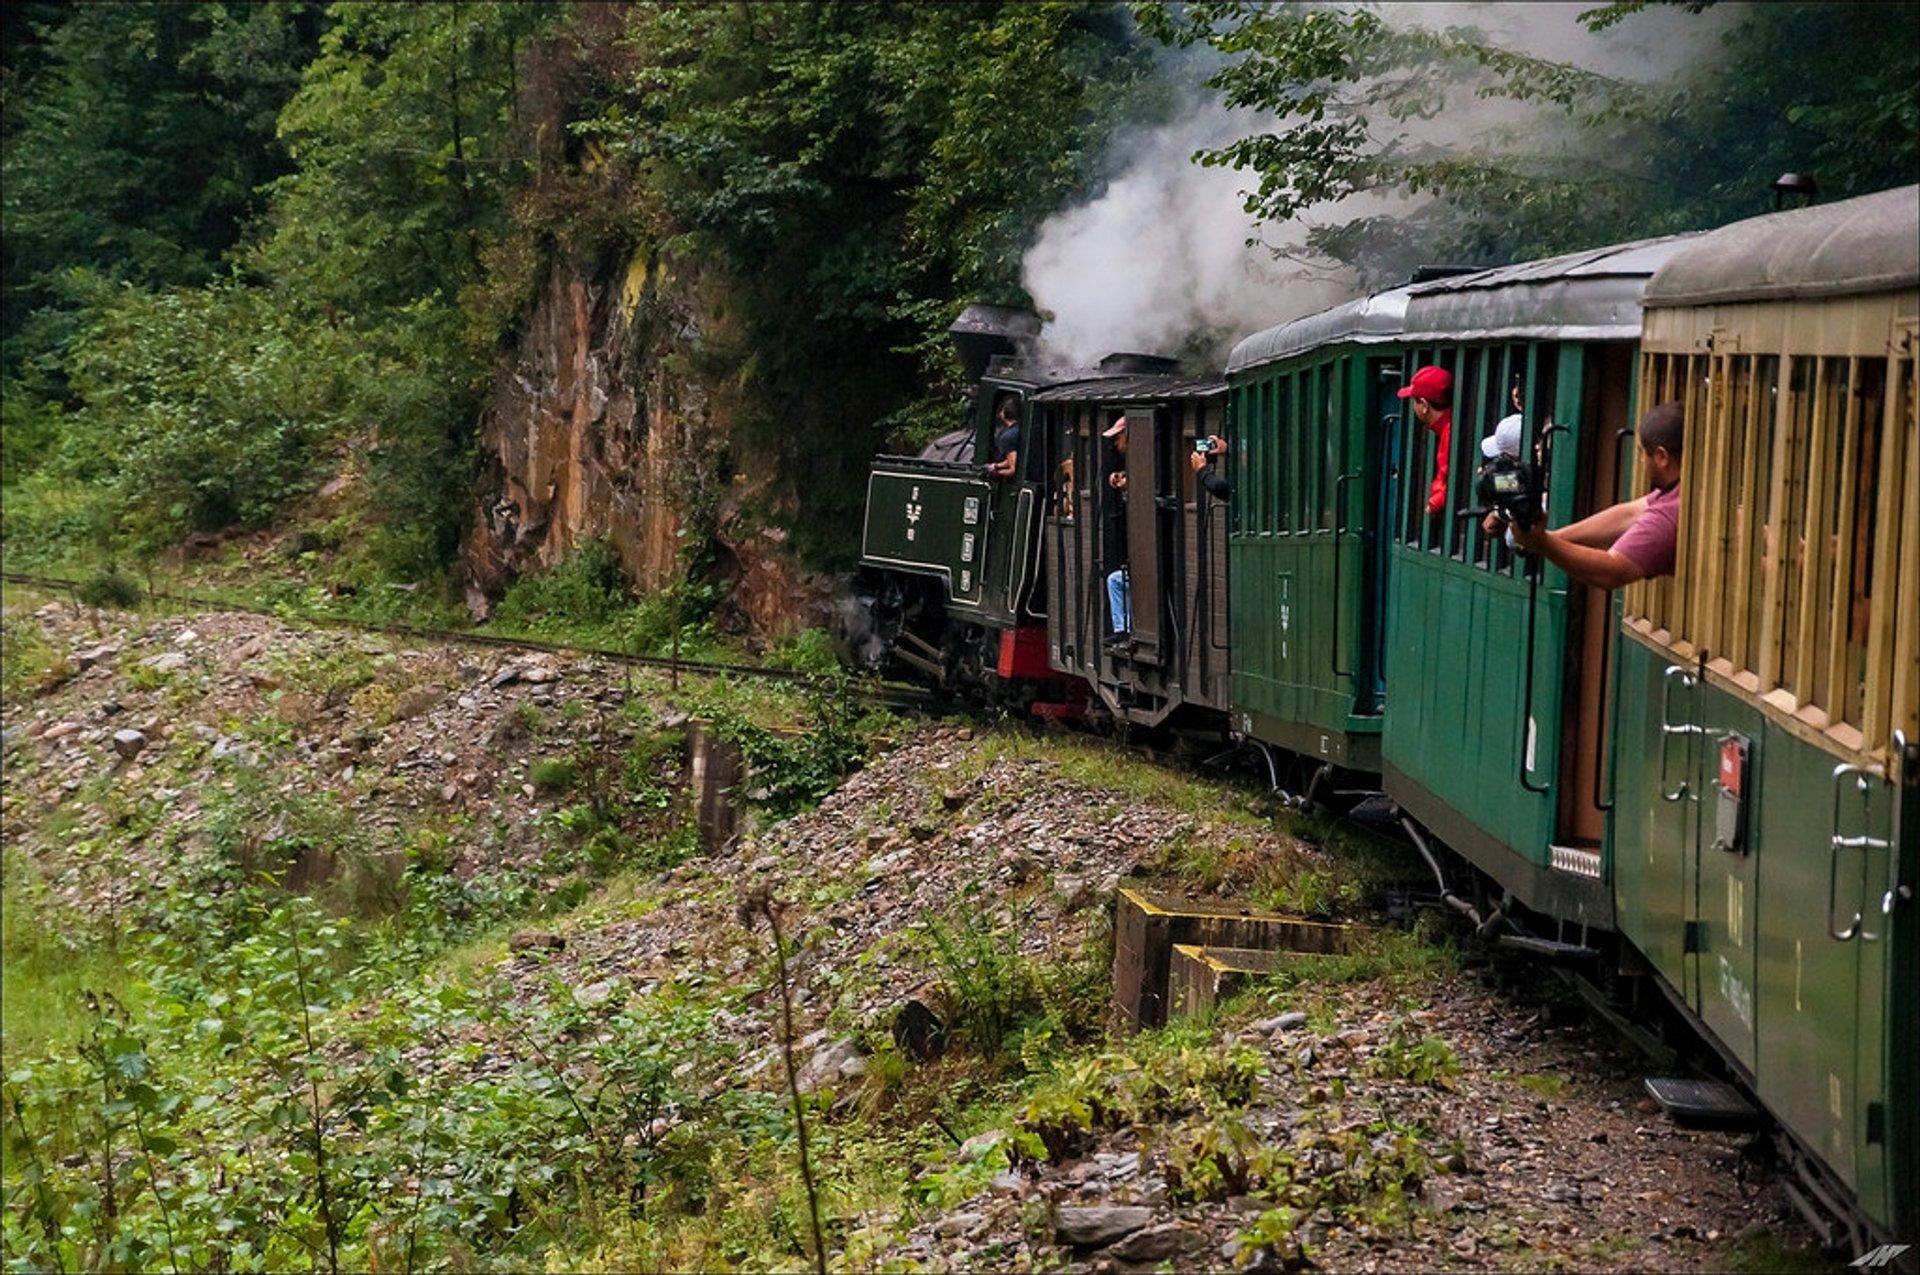 Mocăniţa Steam Train in Romania 2019 - Best Time